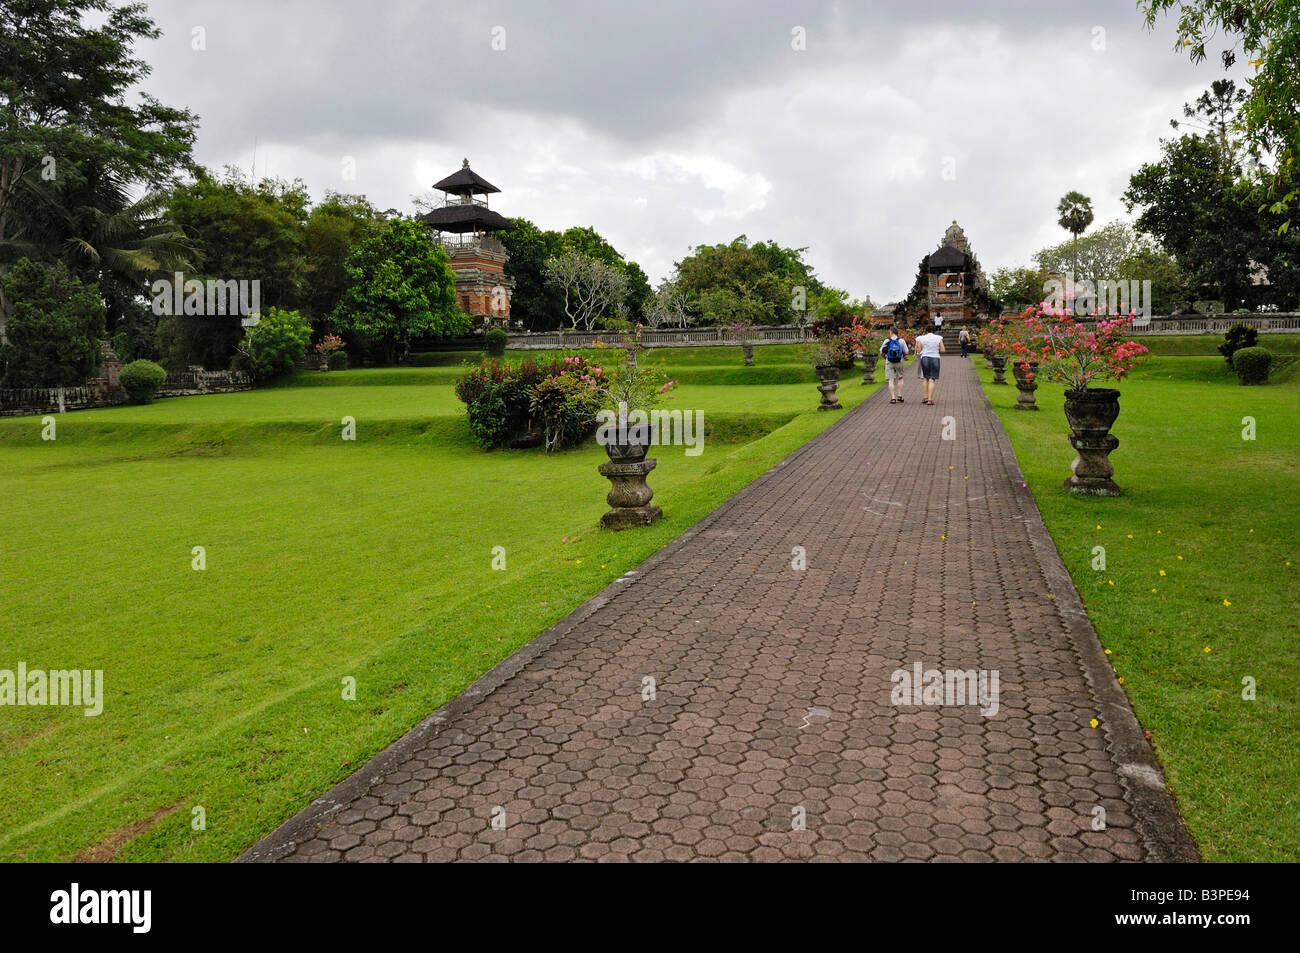 Pura Taman Ayun Temple and Kulkul Tower in Mengwi, Bali, Indonesia - Stock Image